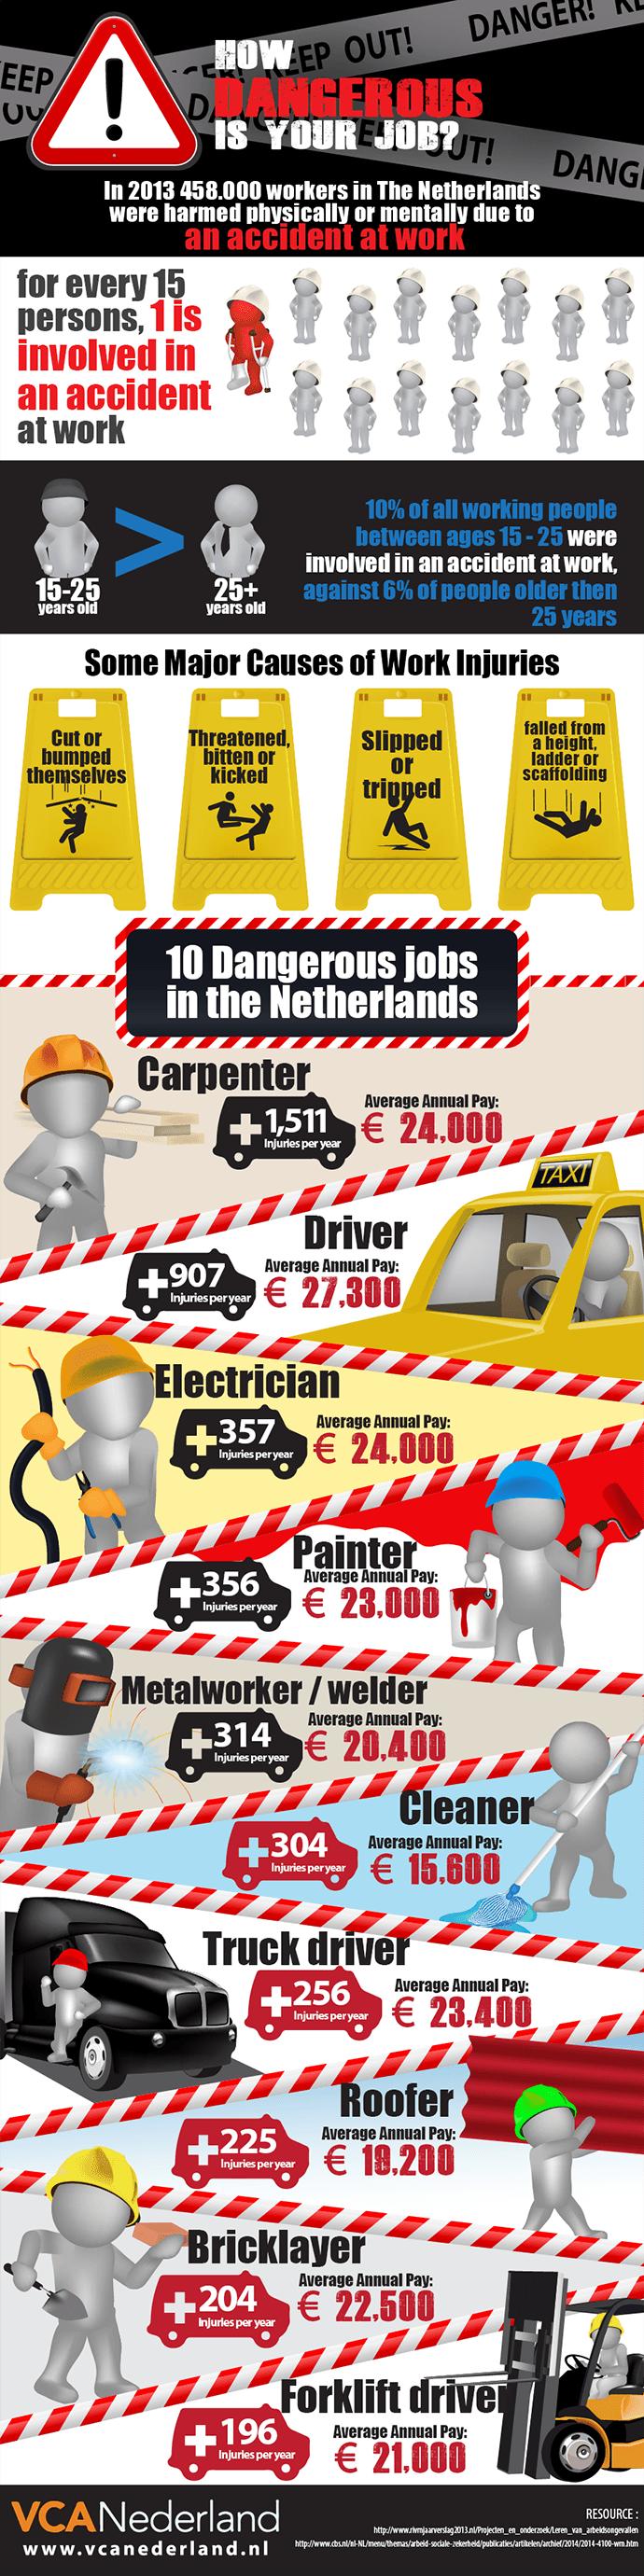 howdangerousisyourjob_infographic_690